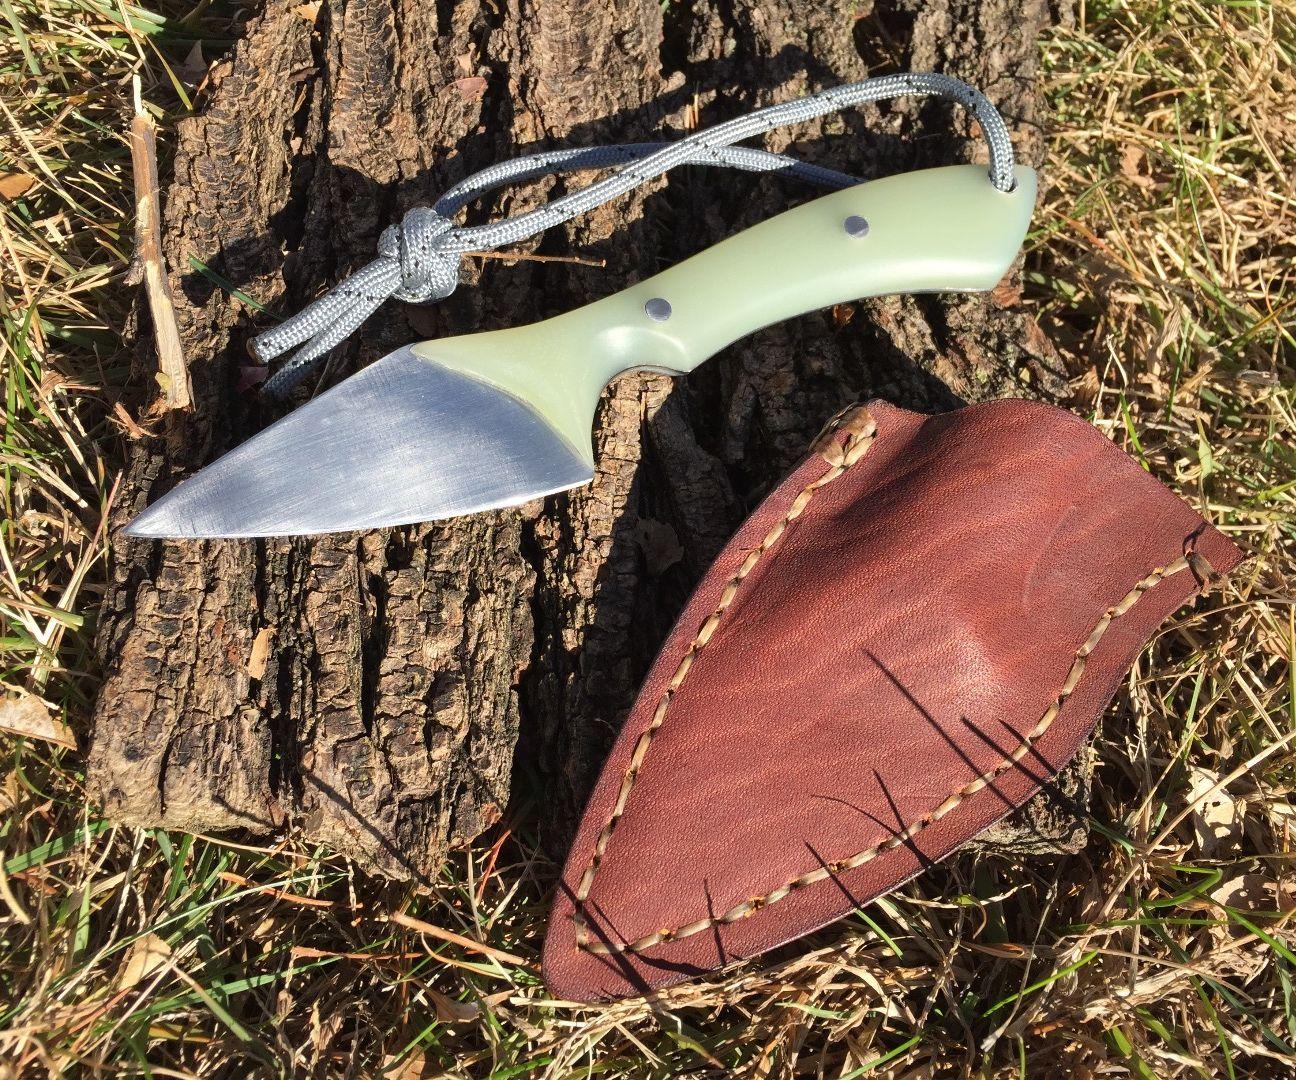 Knifeception